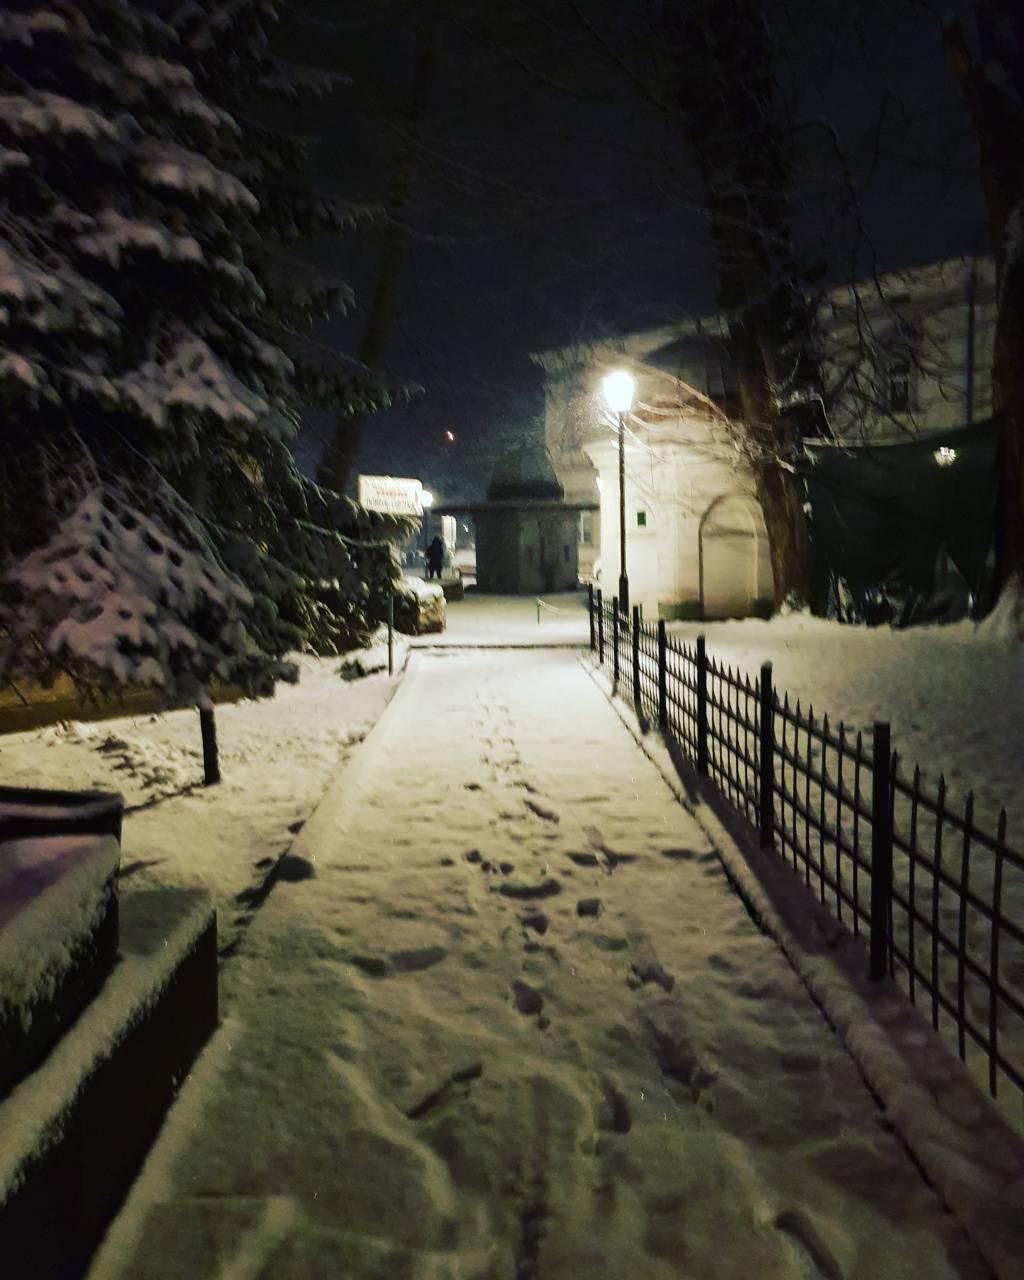 Snowy trail at night